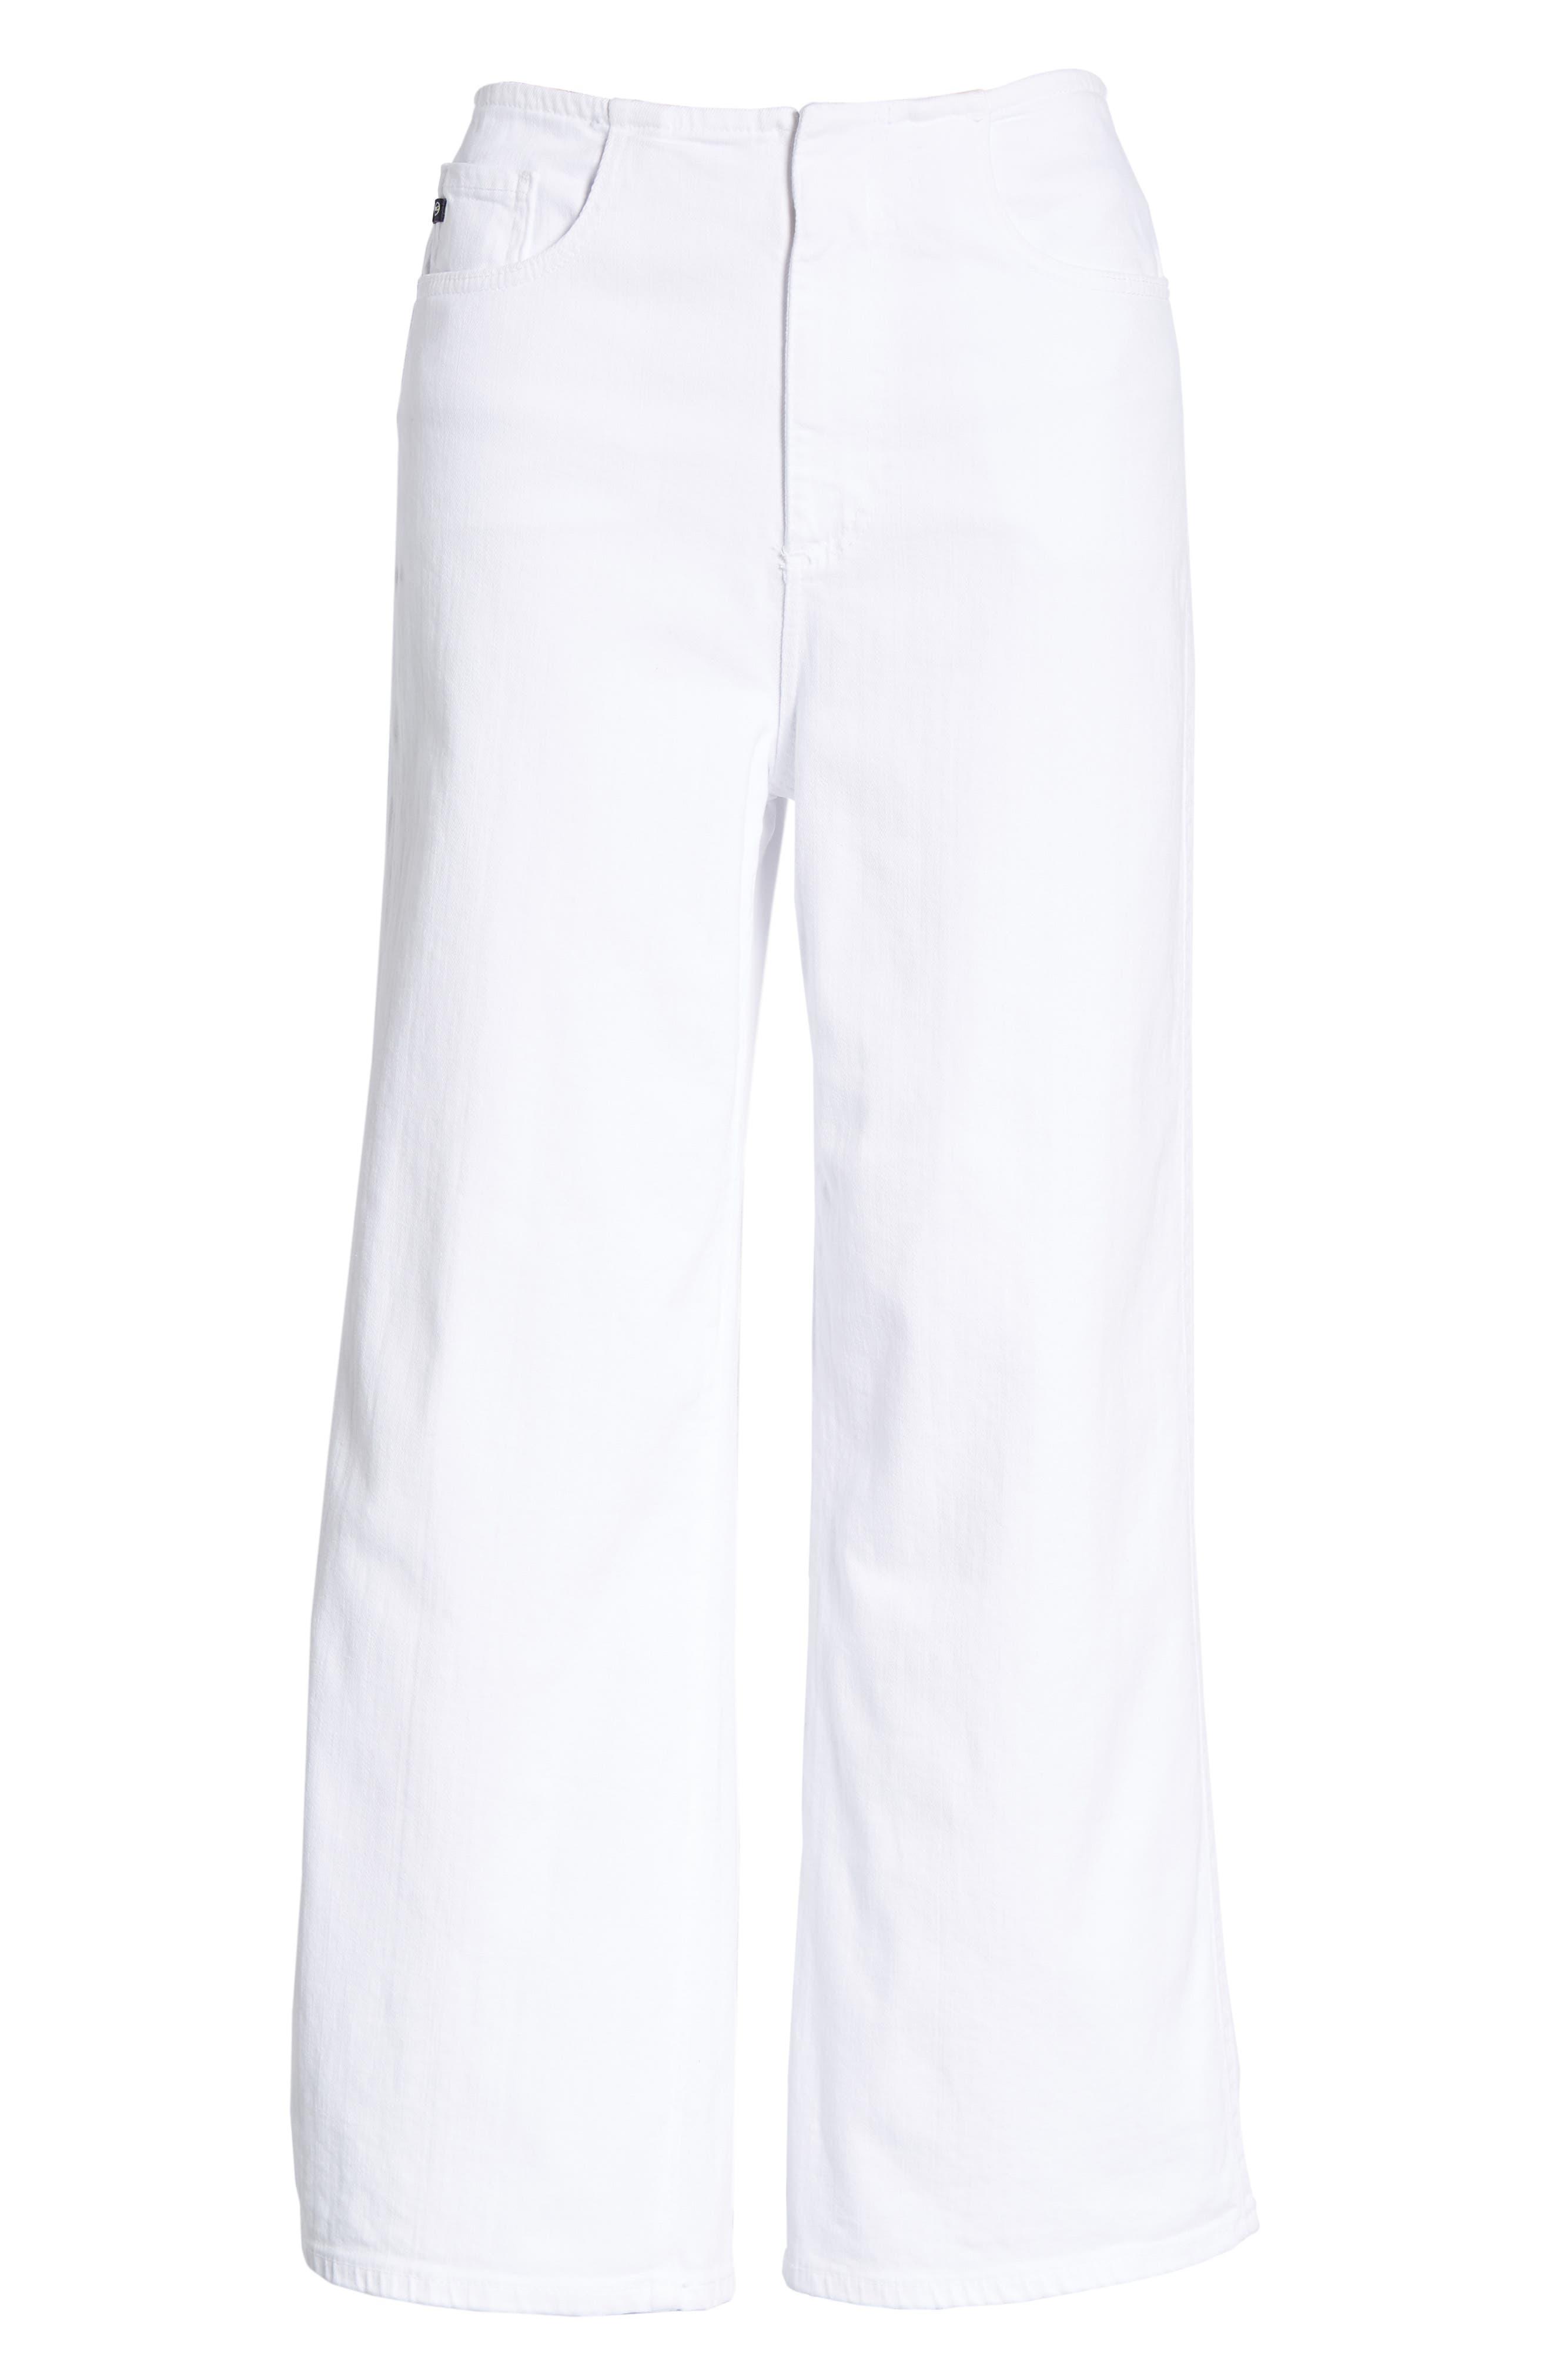 Etta High Waist Crop Wide Leg Jeans,                             Alternate thumbnail 7, color,                             110